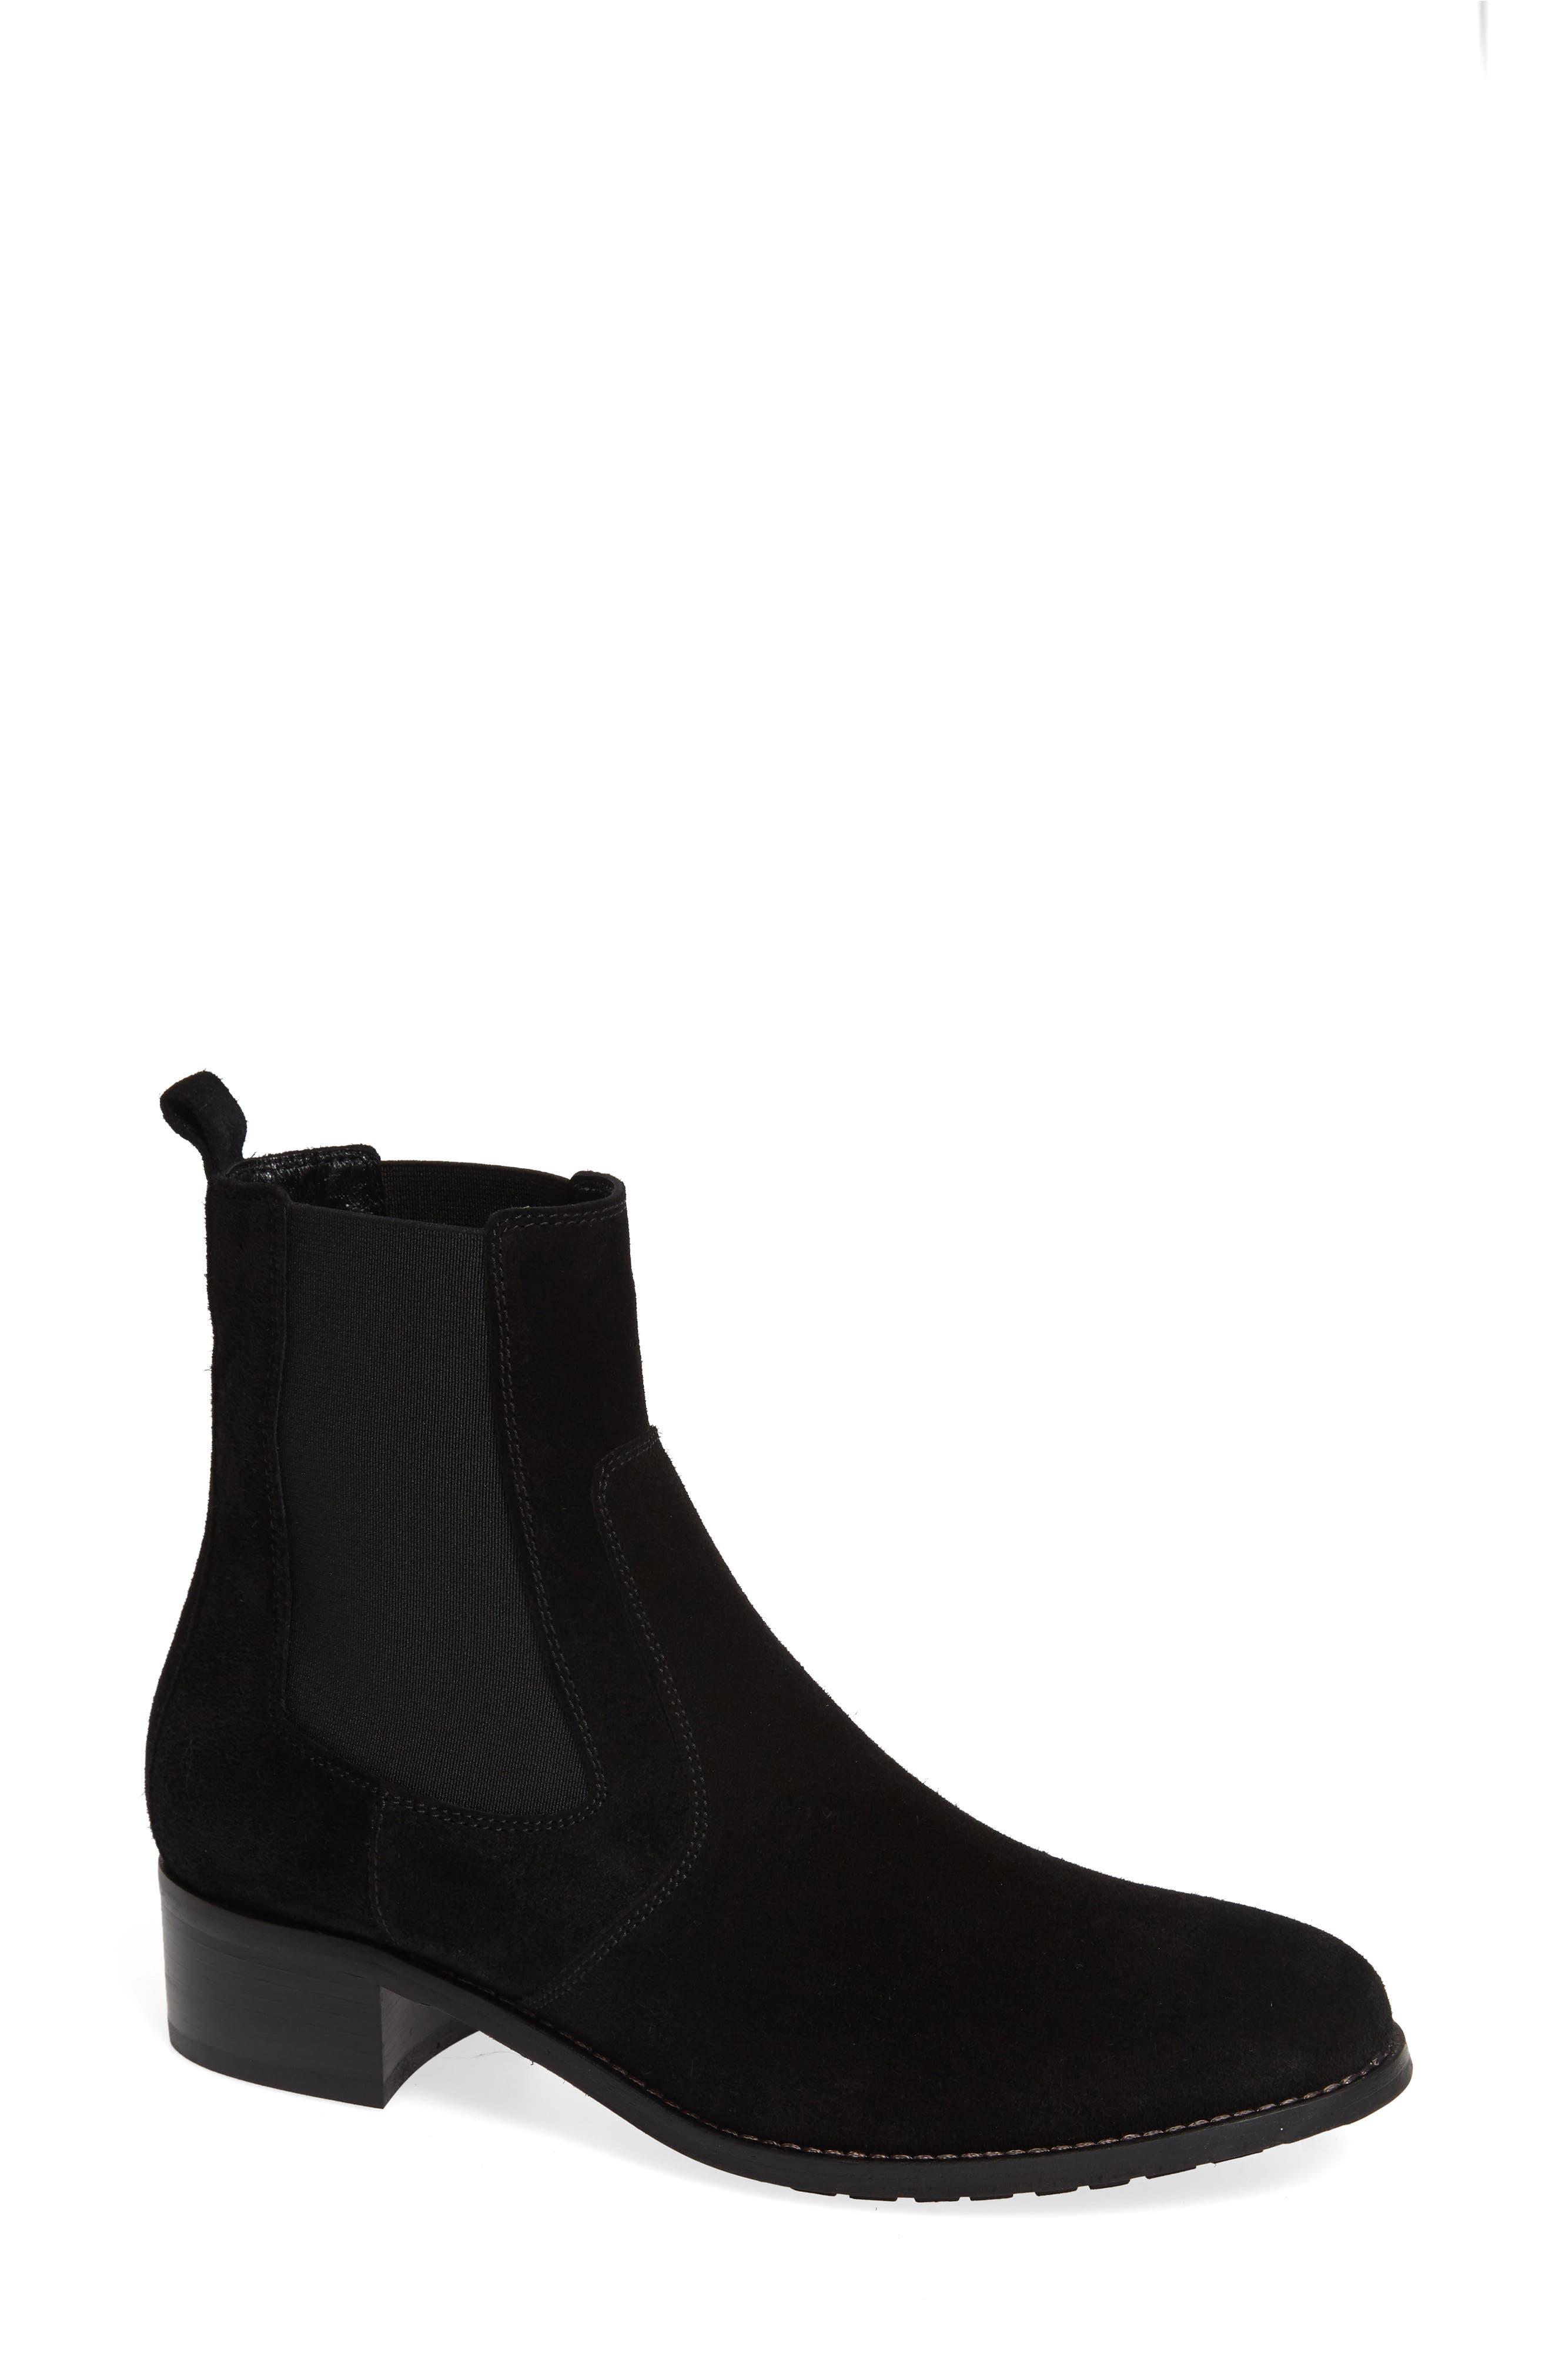 Aquatalia Otilia Weatherproof Chelsea Boot